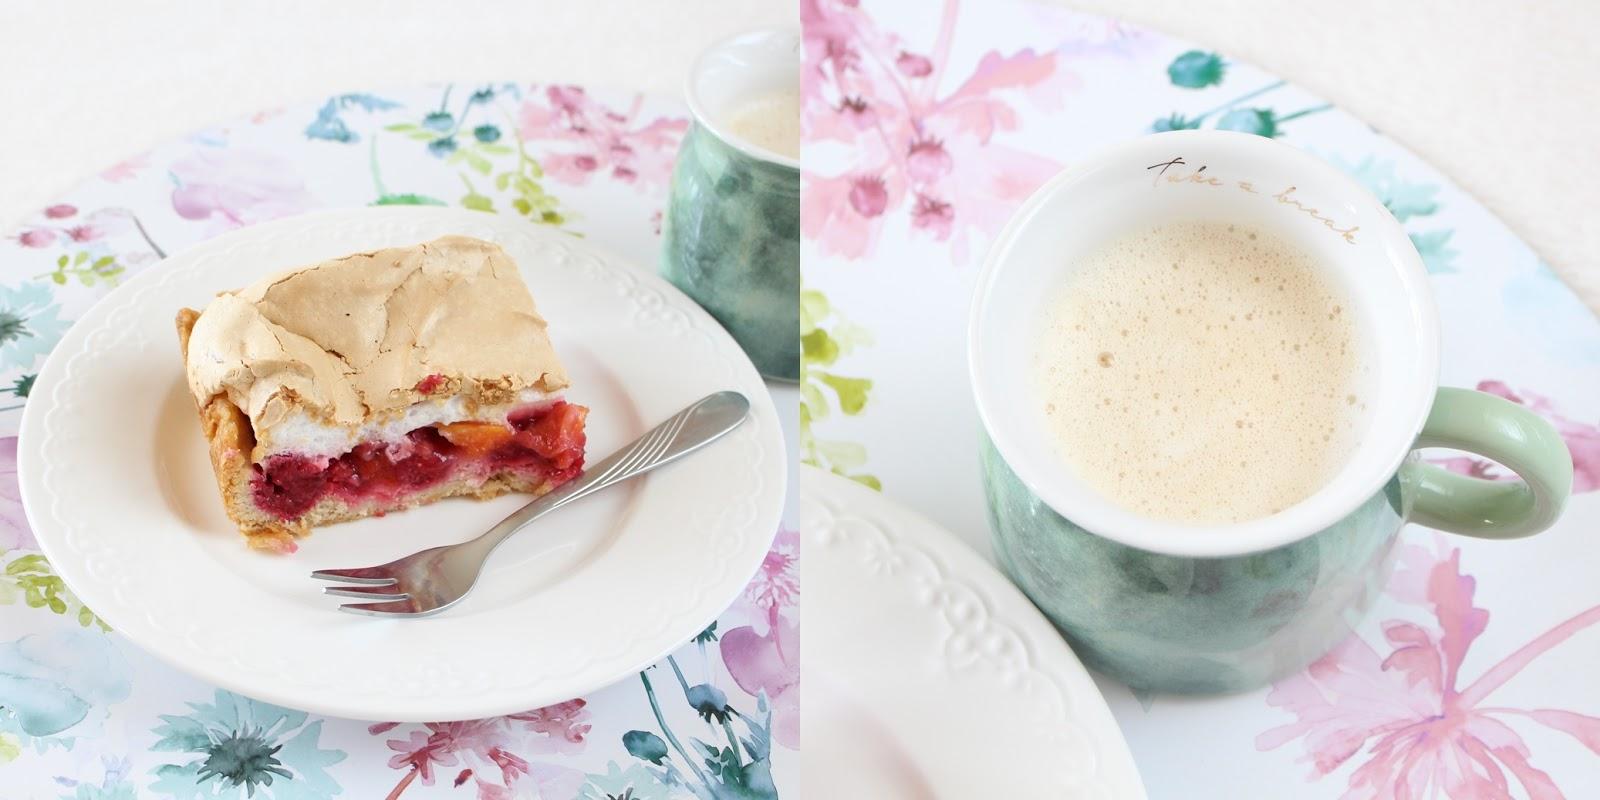 kawa-ciasto-kwestia-smaku-foodbook